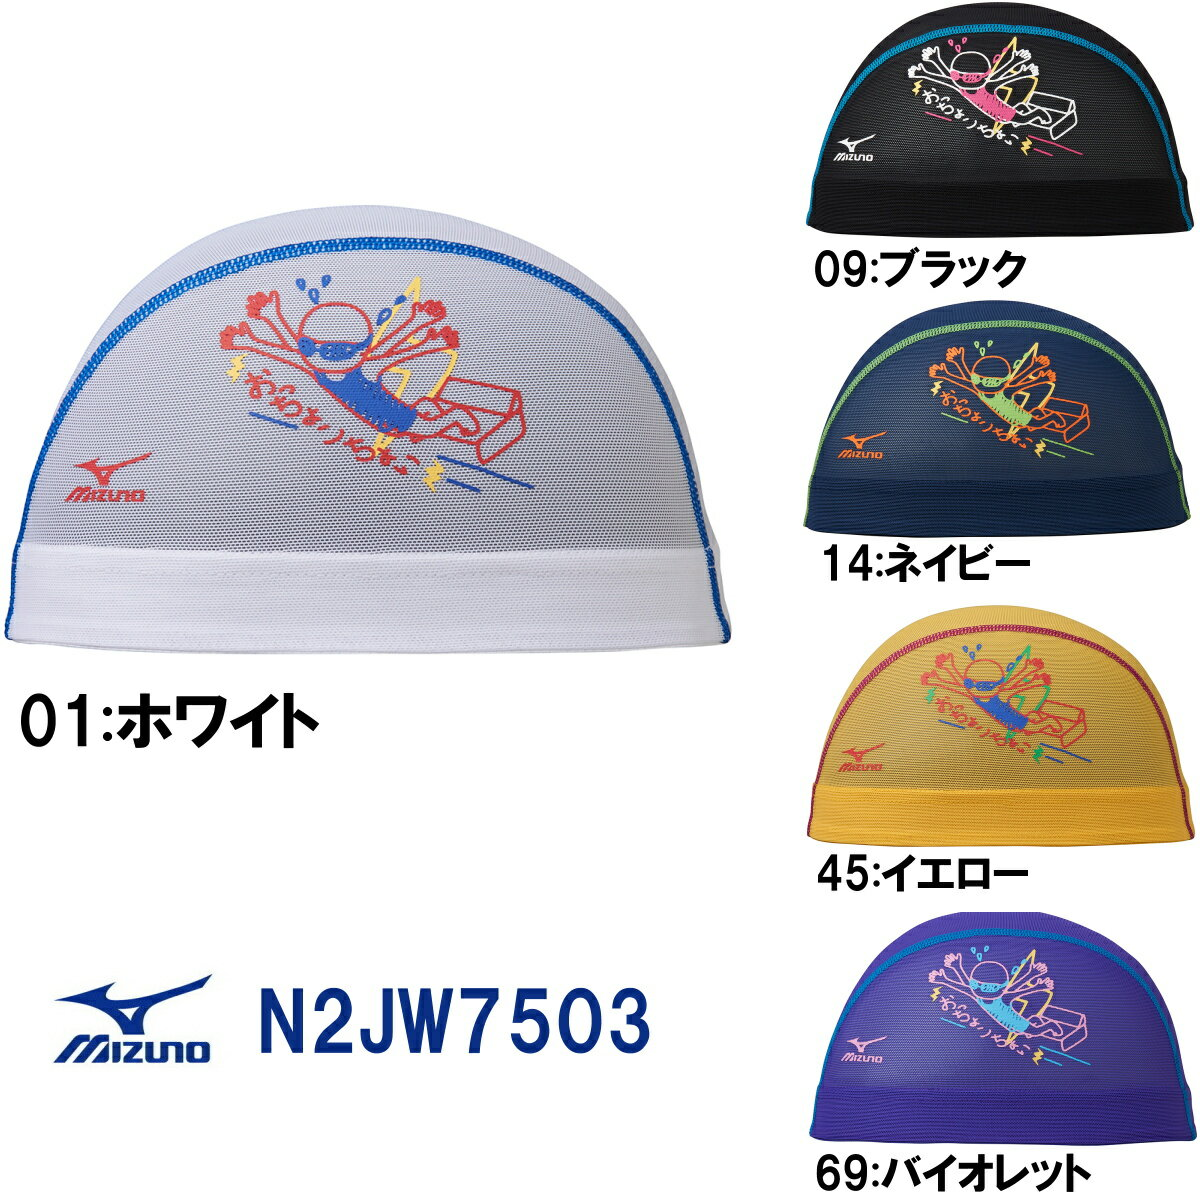 MIZUNO ミズノ メッシュキャップ 2017年AW展示会受注生産モデル N2JW7503-HK